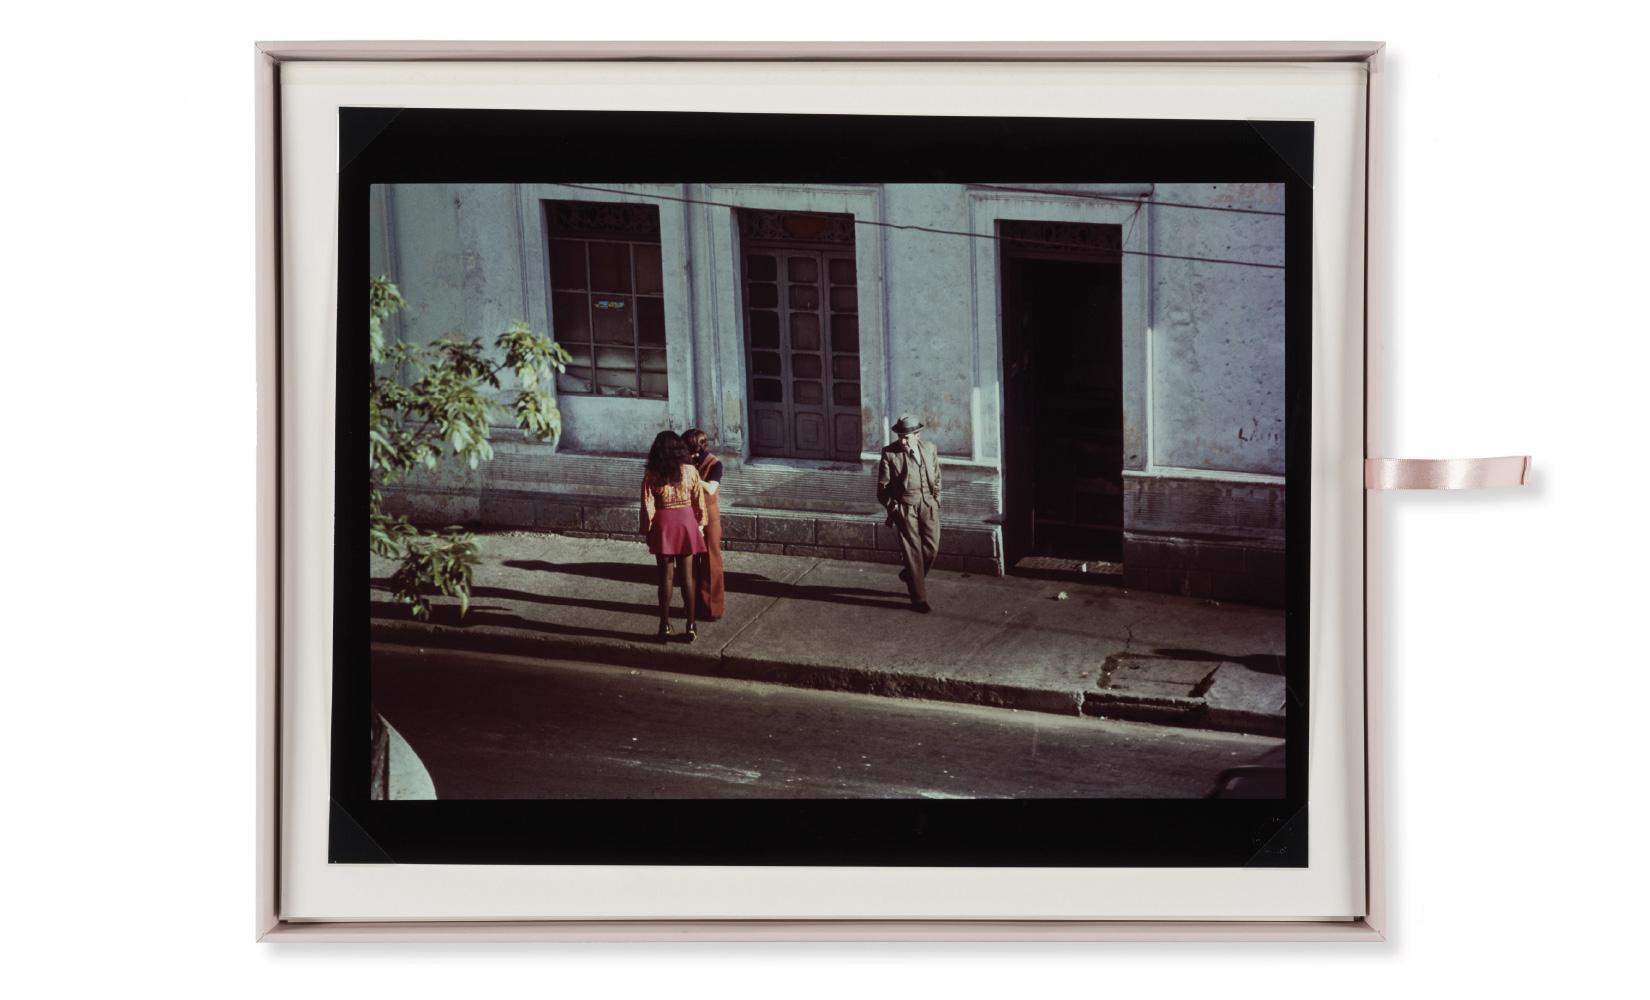 esquina-rose-rojas-toluca-studio-olivier-andreotti-10.jpg